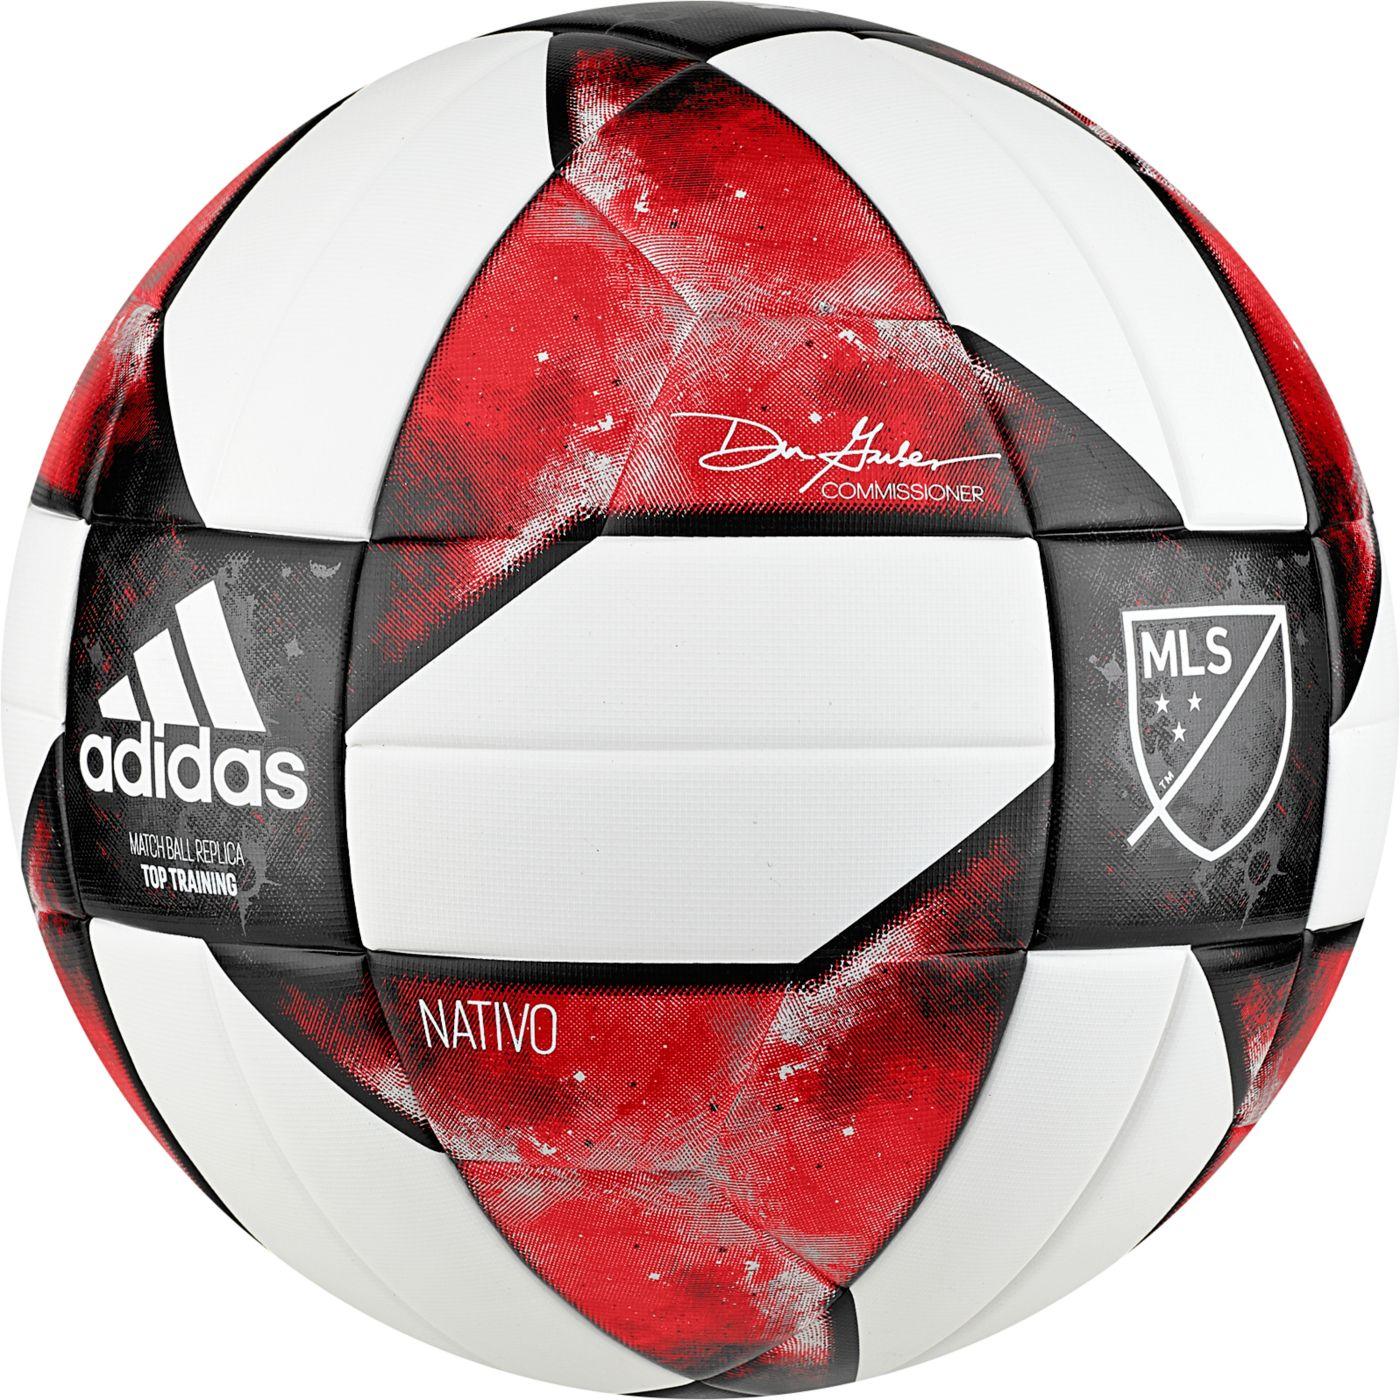 adidas MLS 2019 NFHS Top Training Soccer Ball